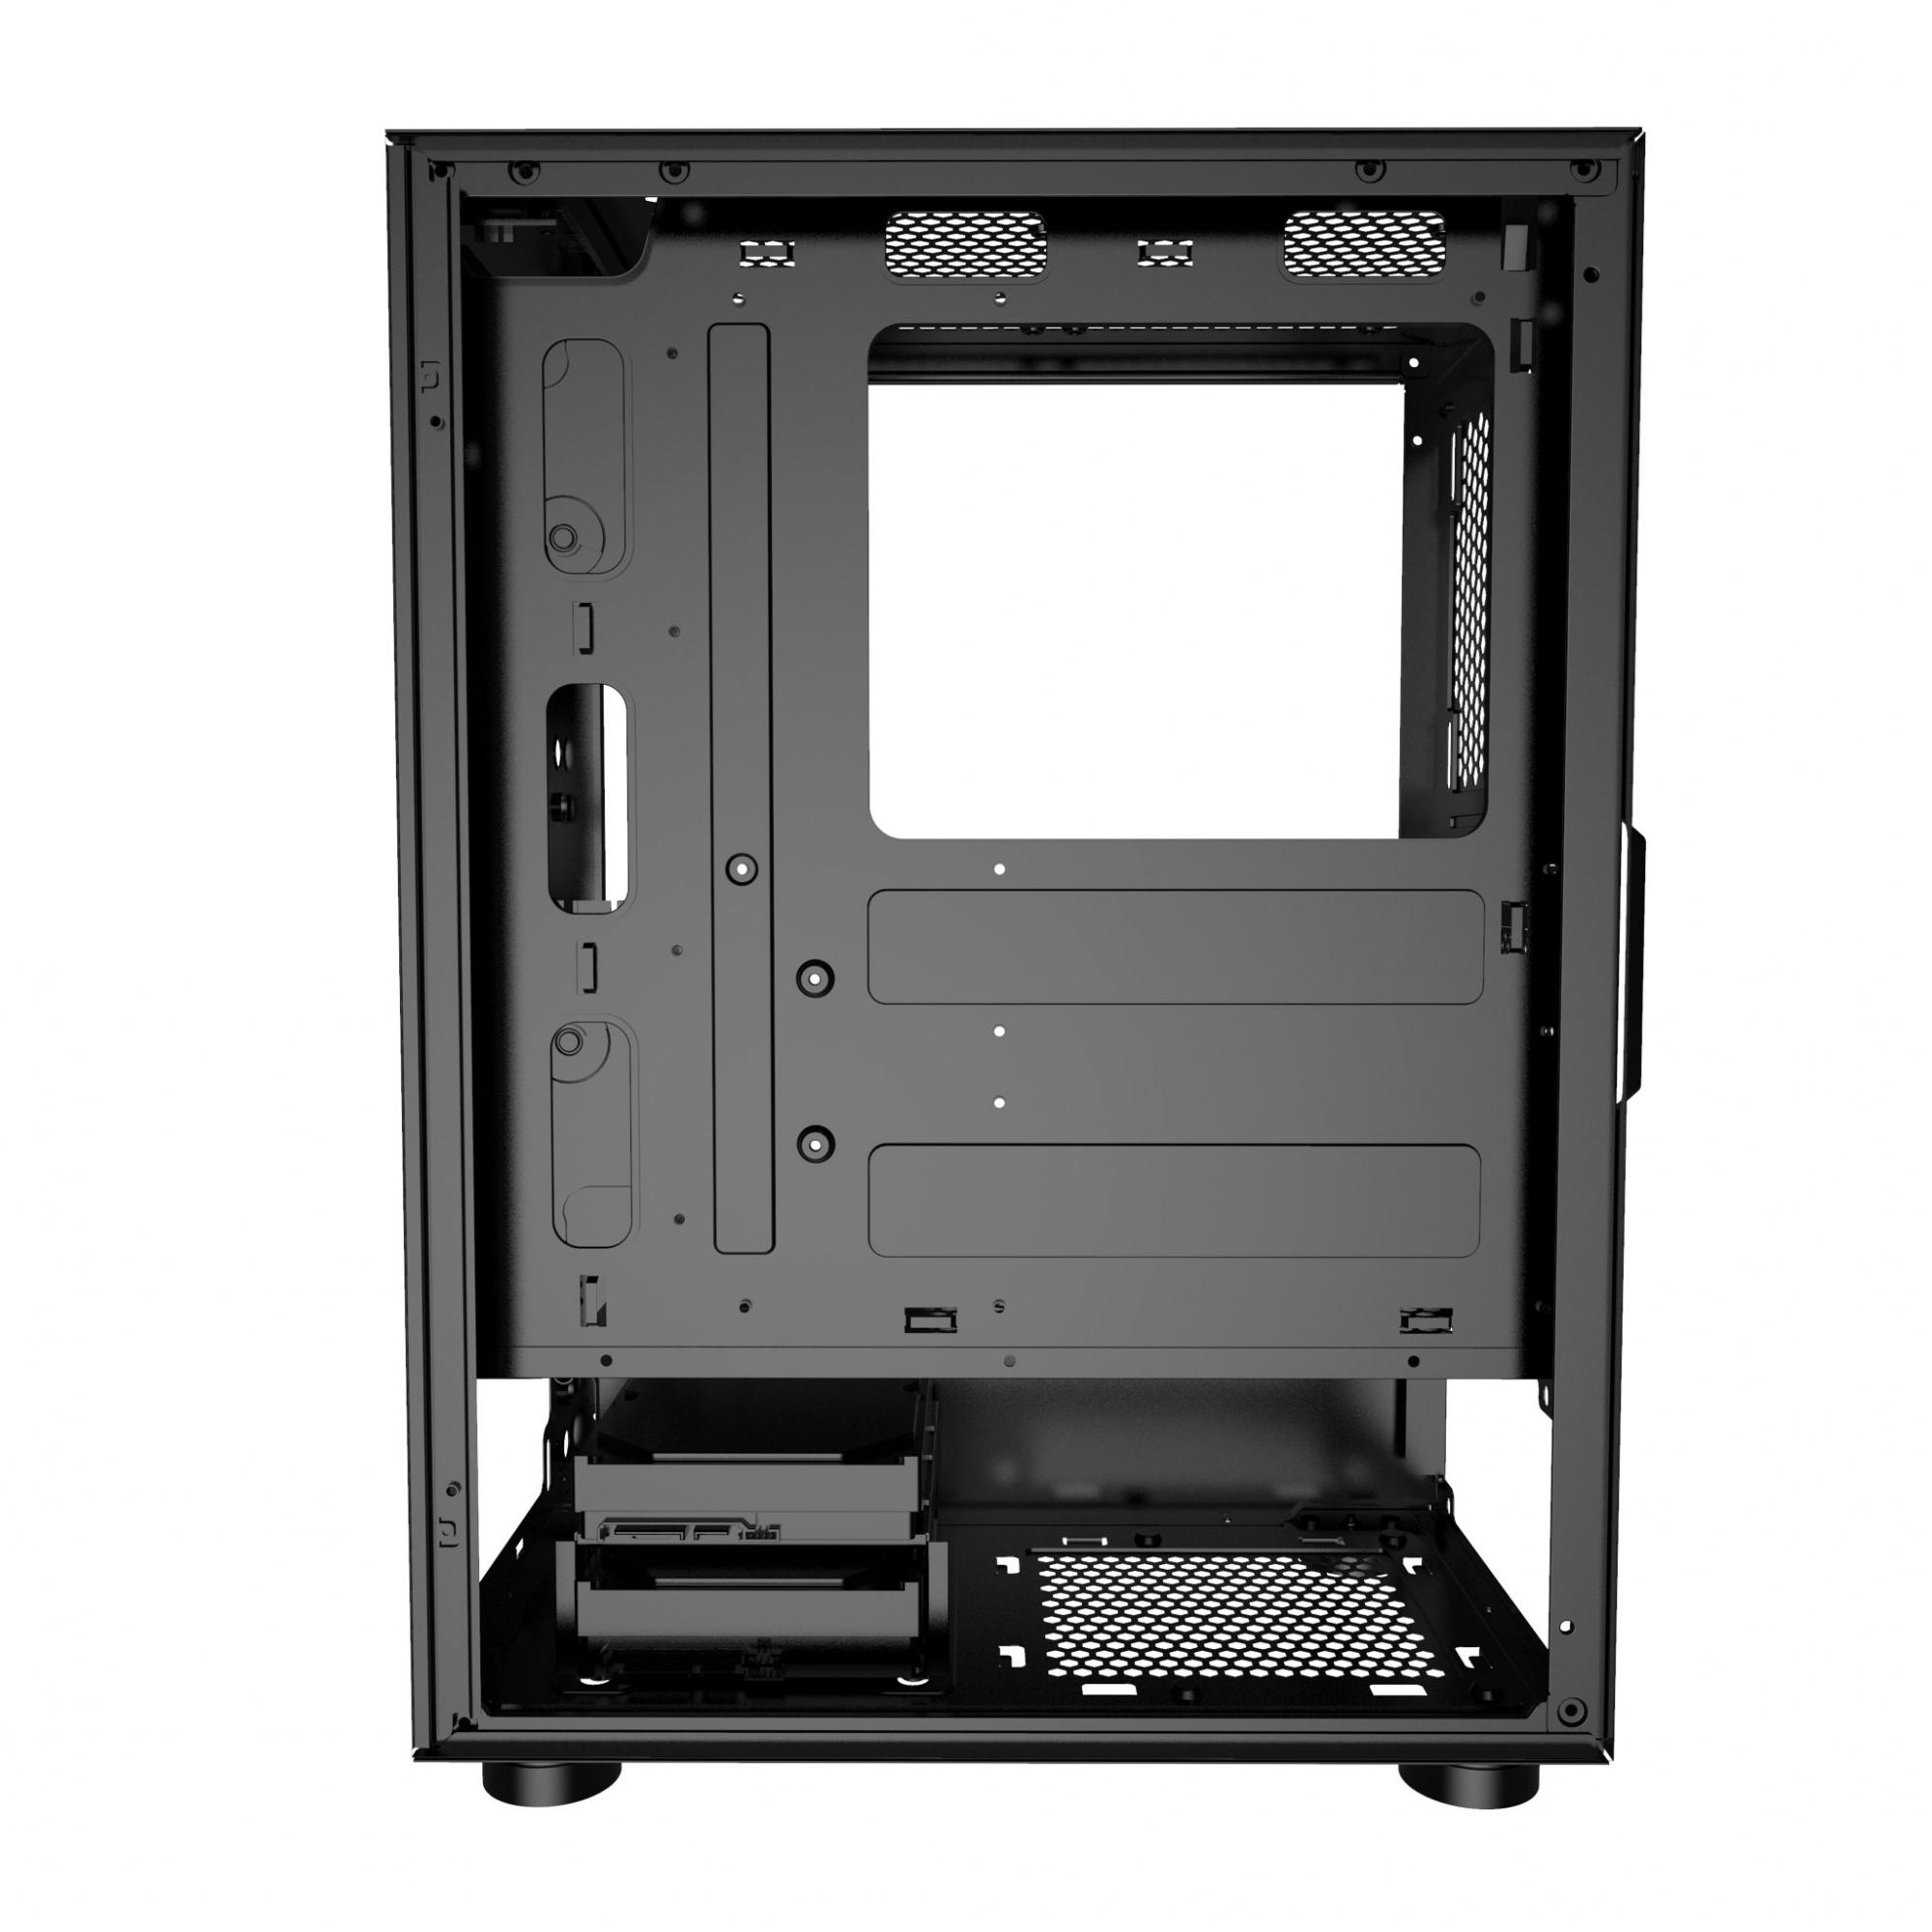 GABINETE GAMER BG-034 PULSE PRETO BLUECASE  S/ FONTE / LED RGB / USB 3.0  - Fatality